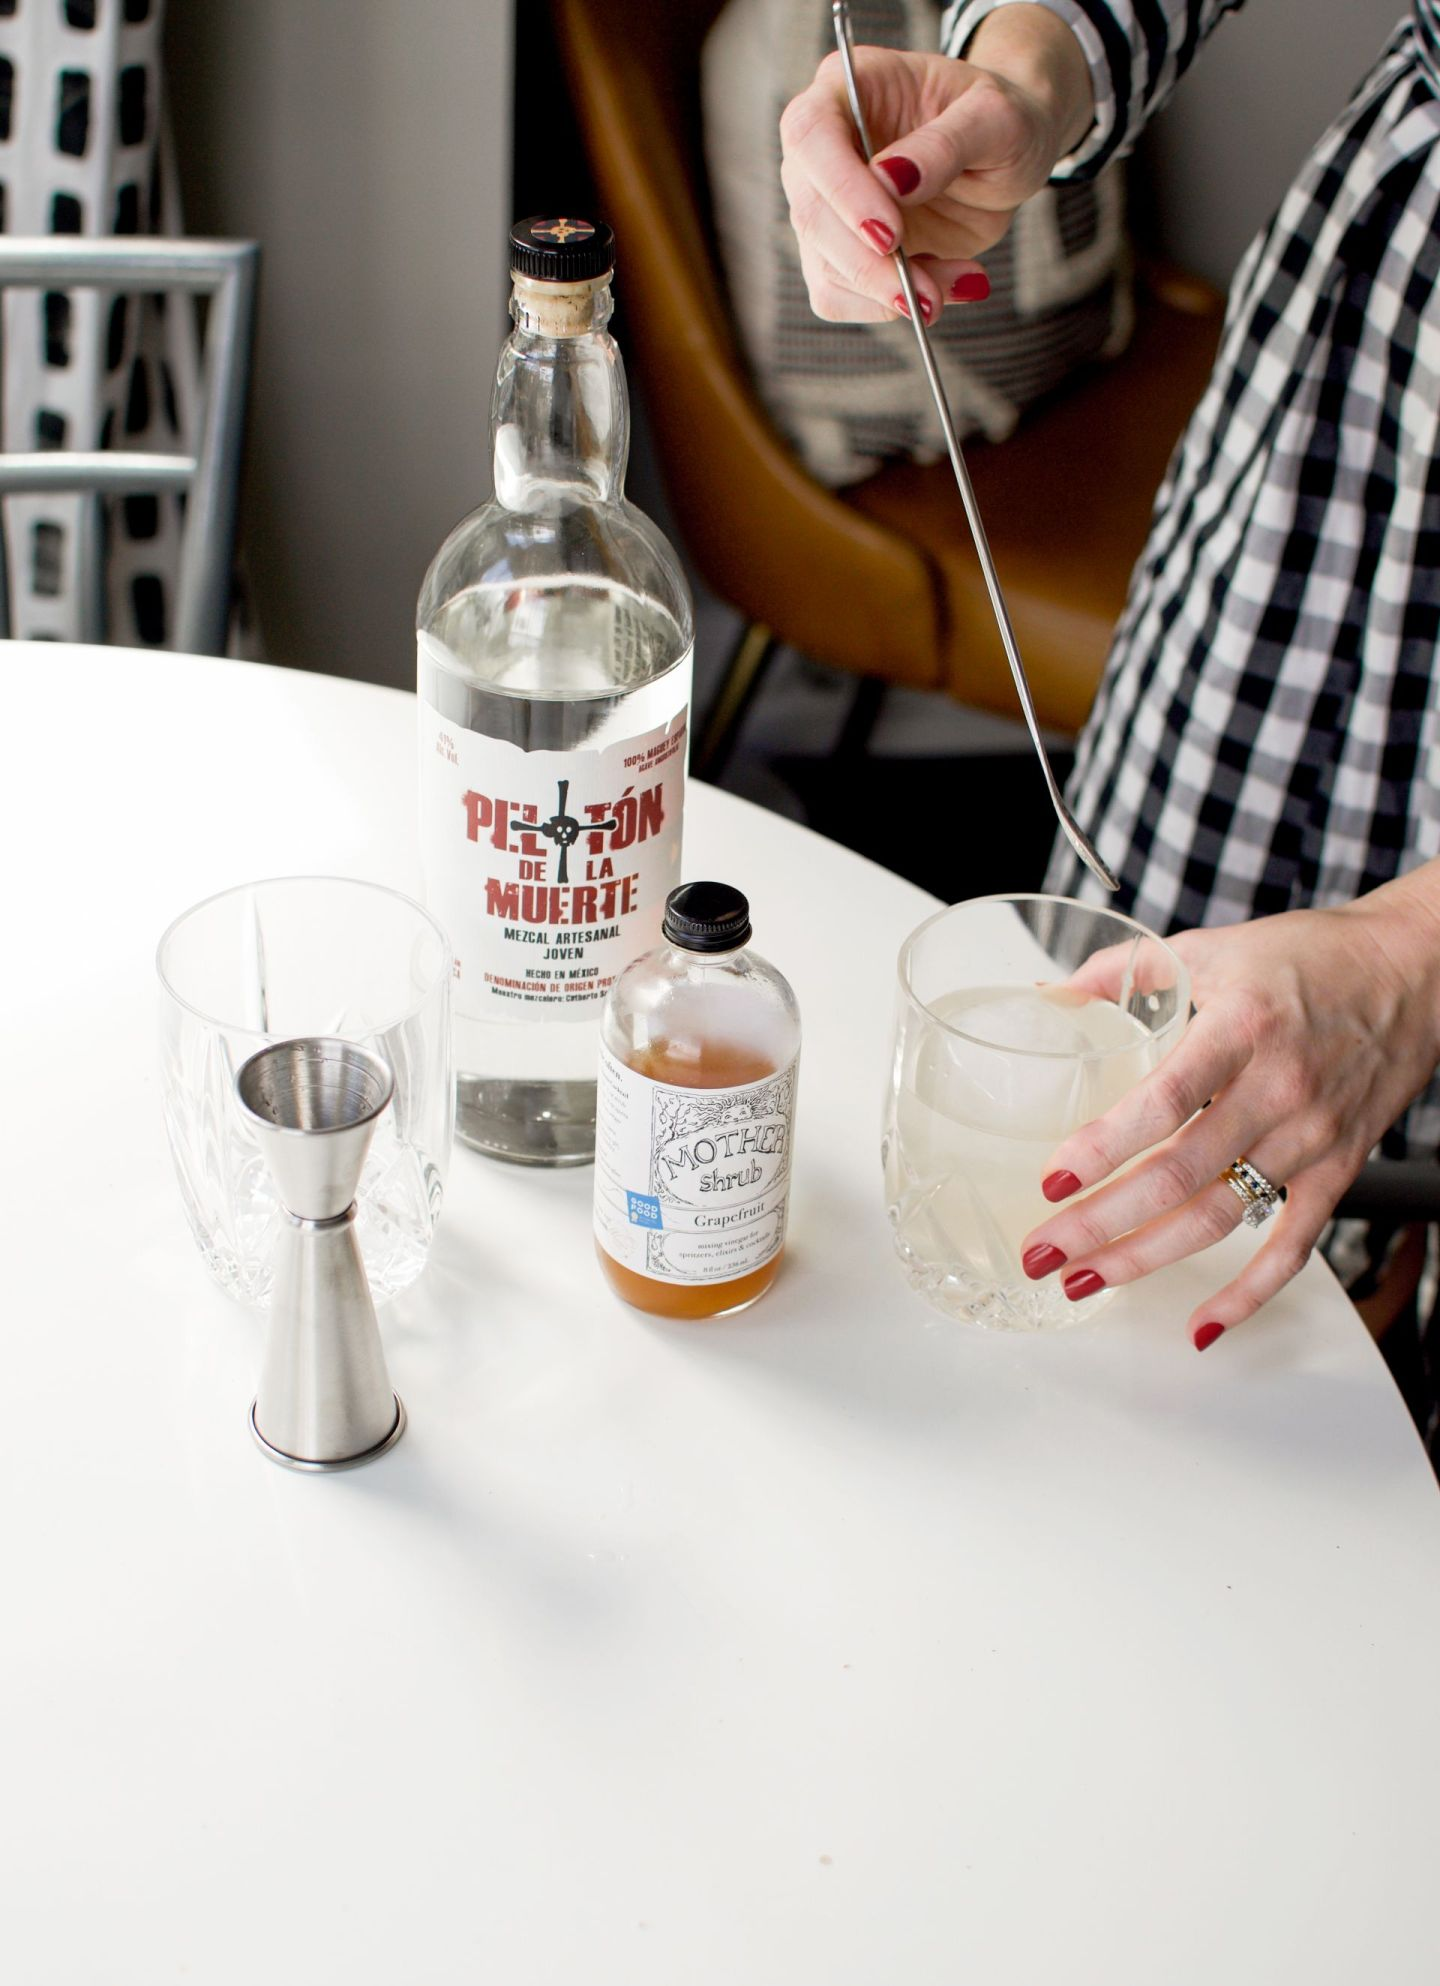 grapefruit shrub cocktail - drinking vinegar cocktail